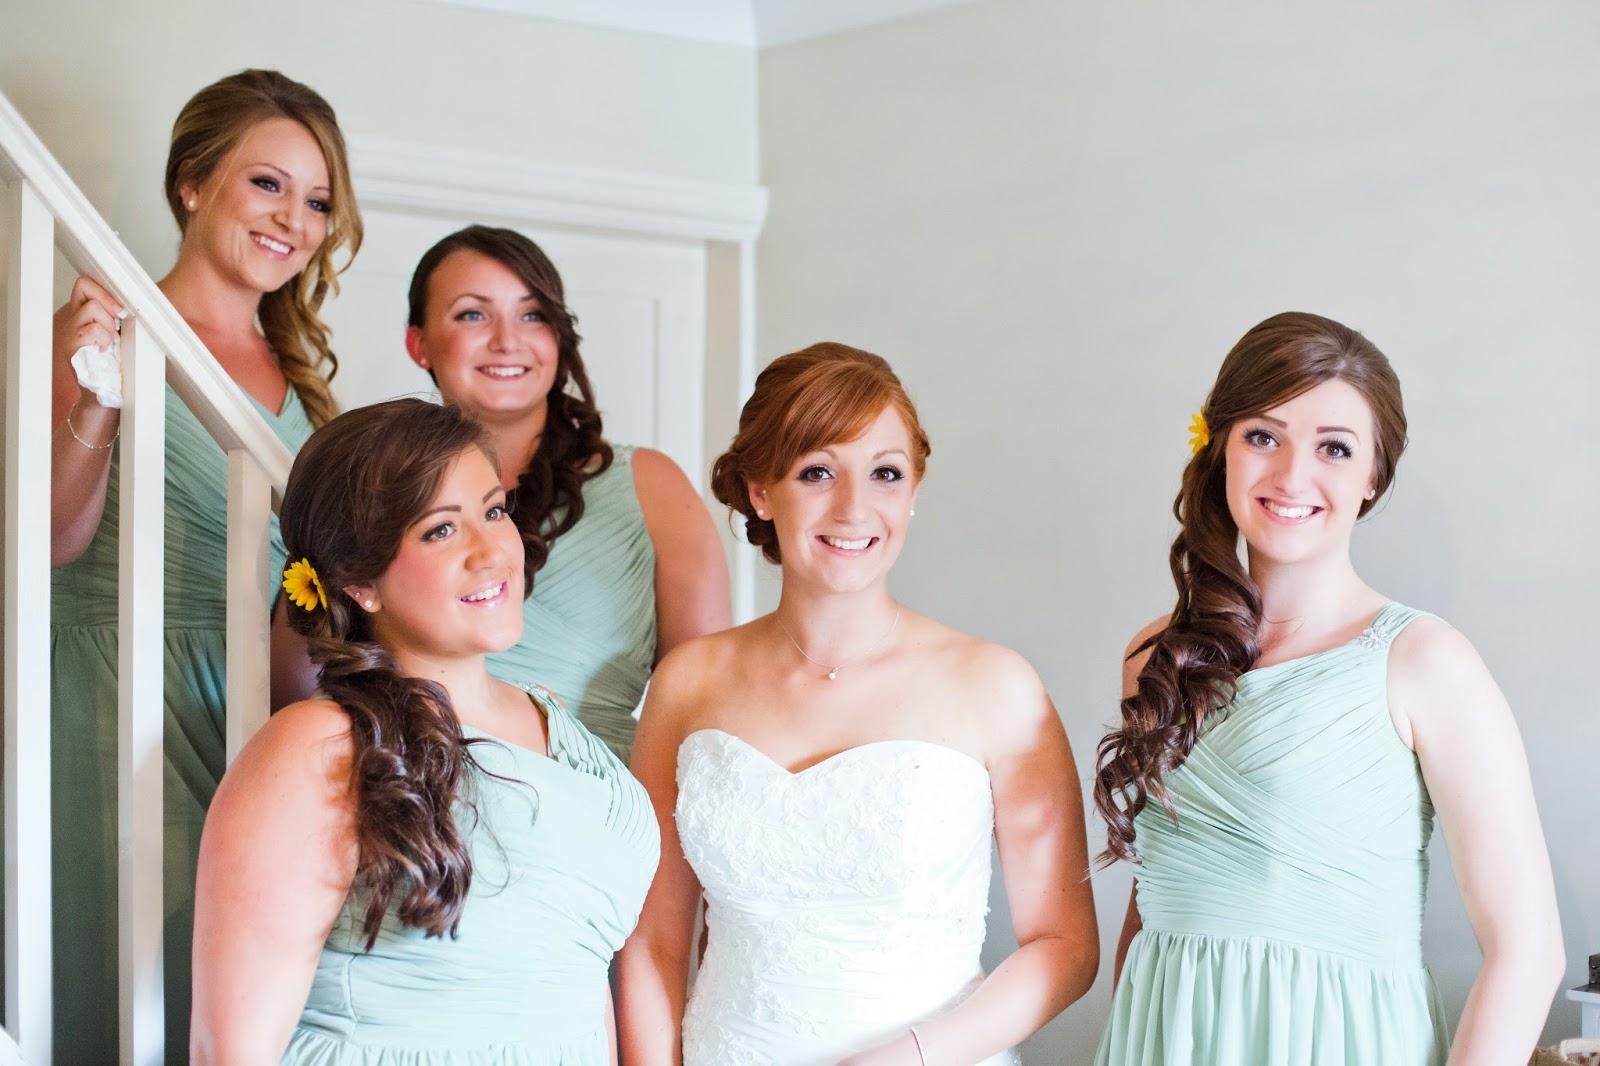 laura-jane prisk hair and makeup artist: bridal makeup